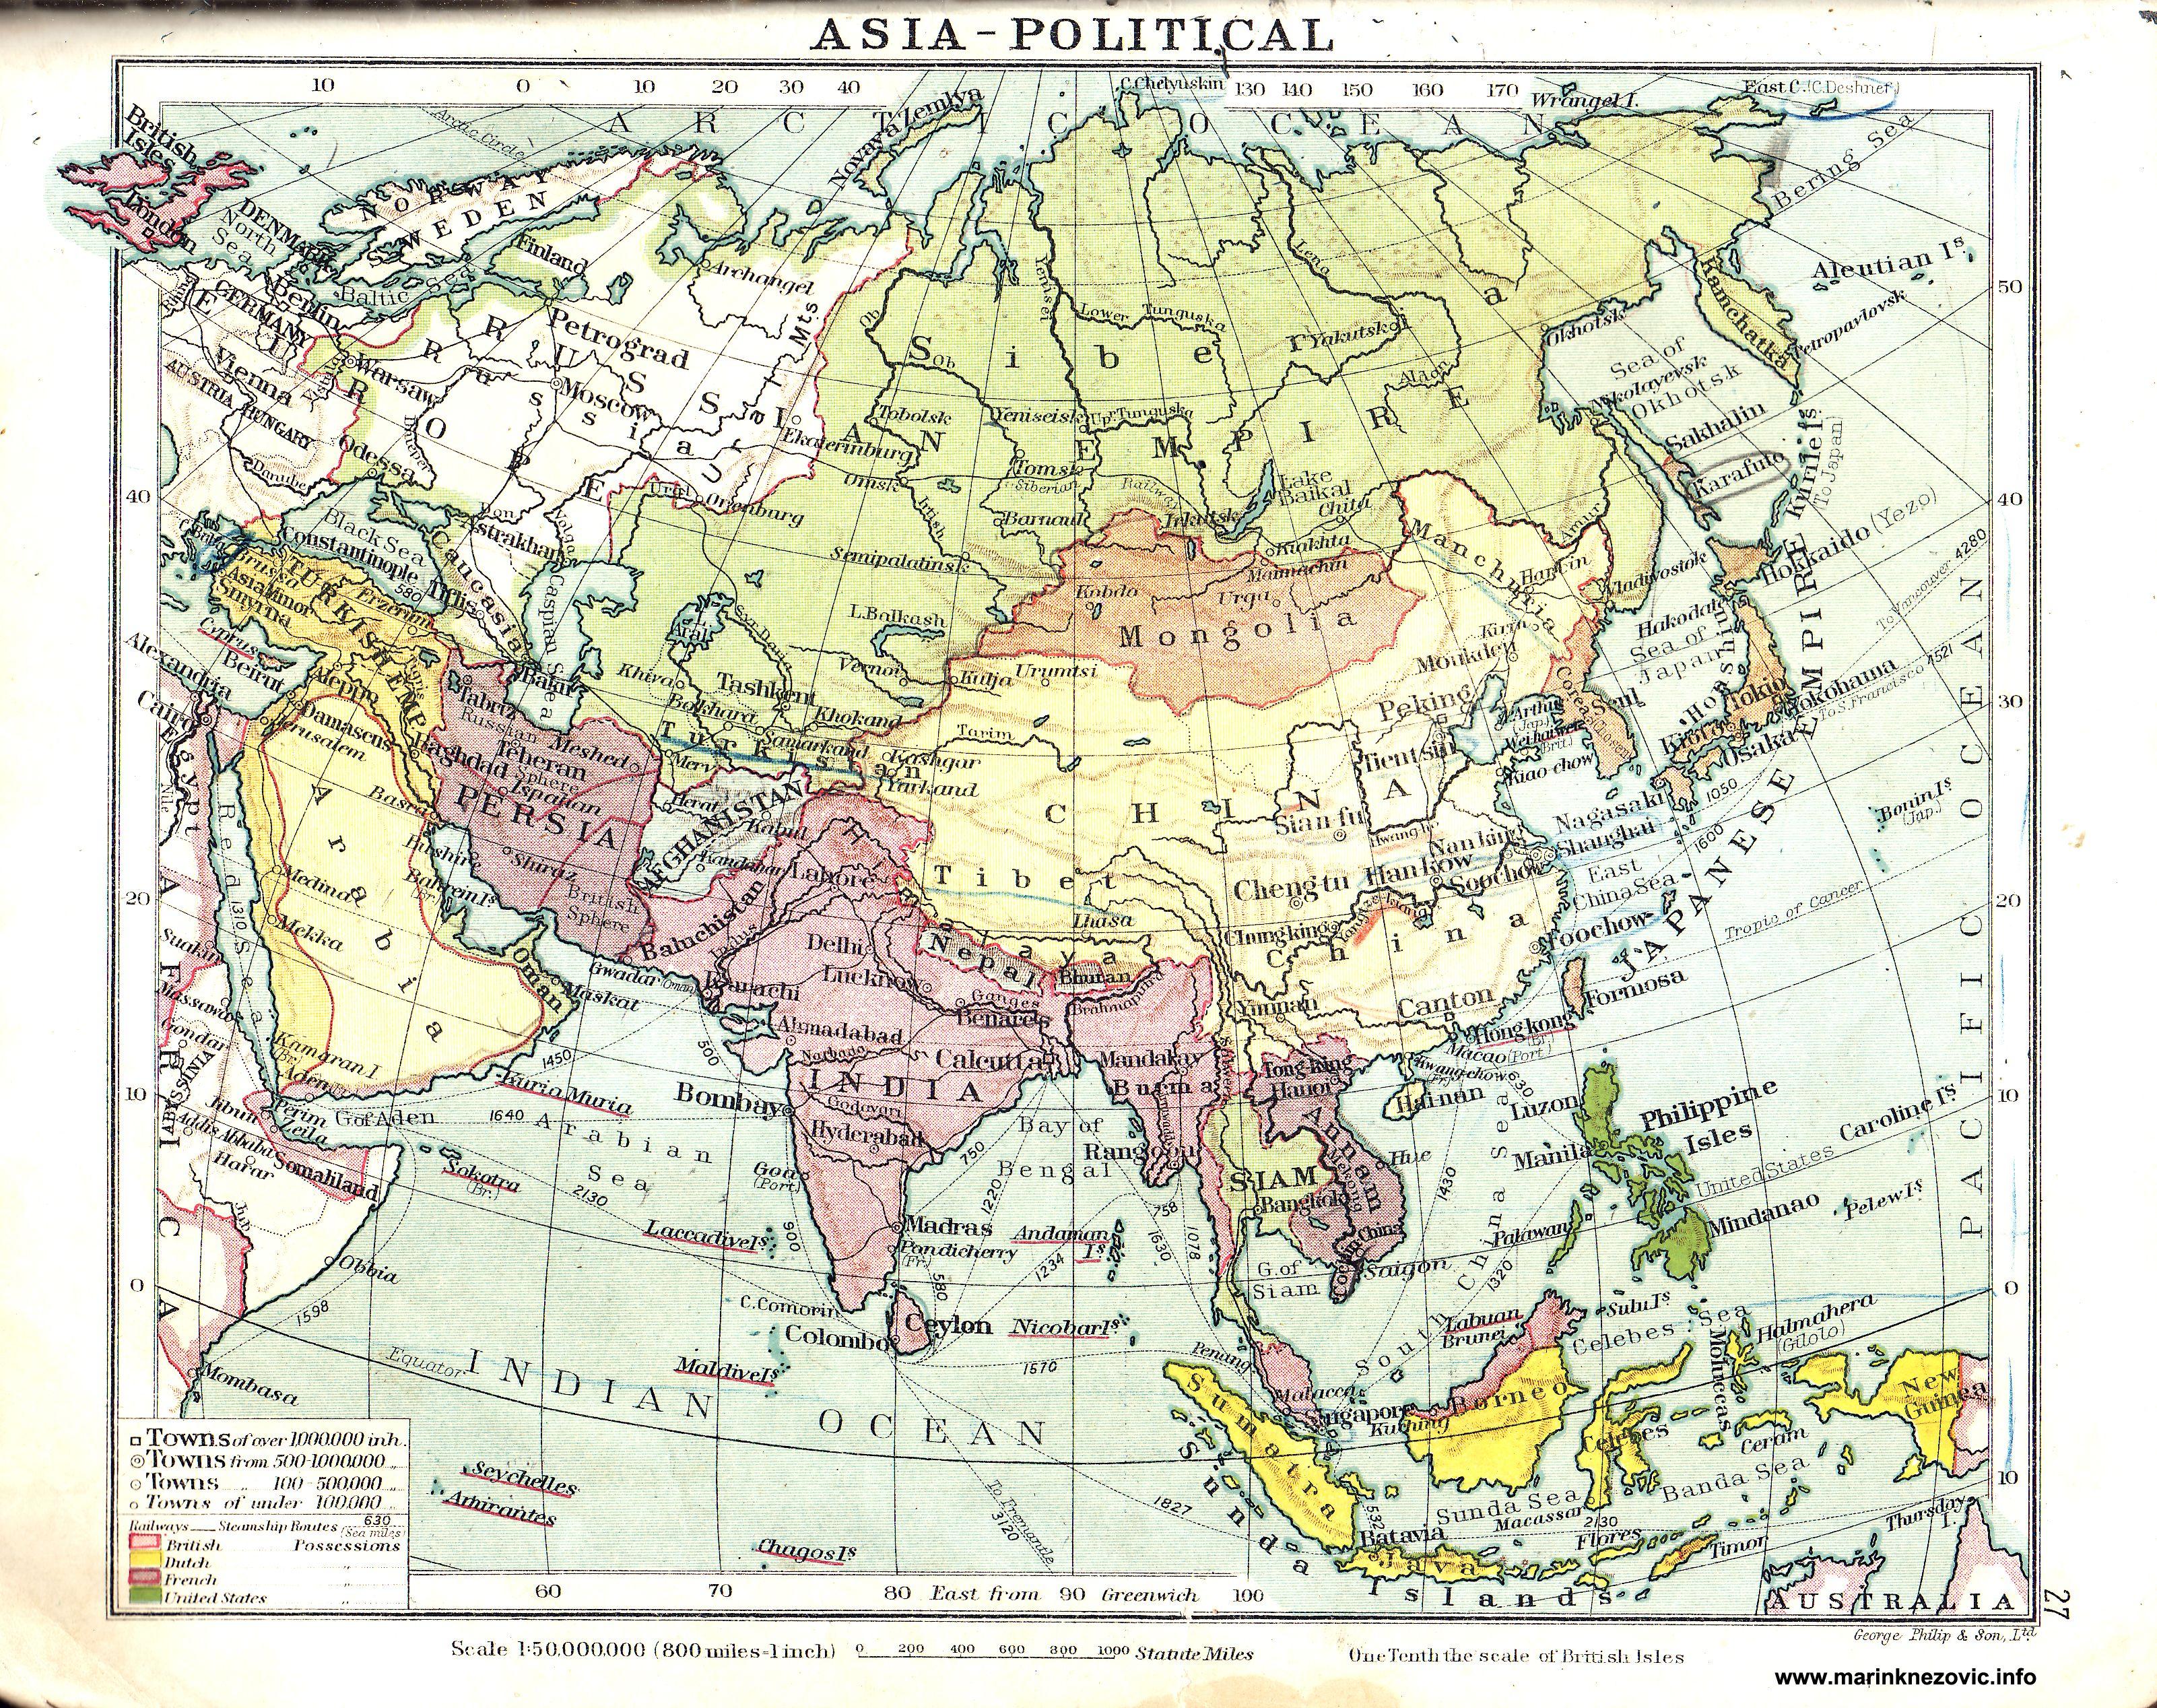 Politicka Karta Azije Asia Political Vintage World Maps Map